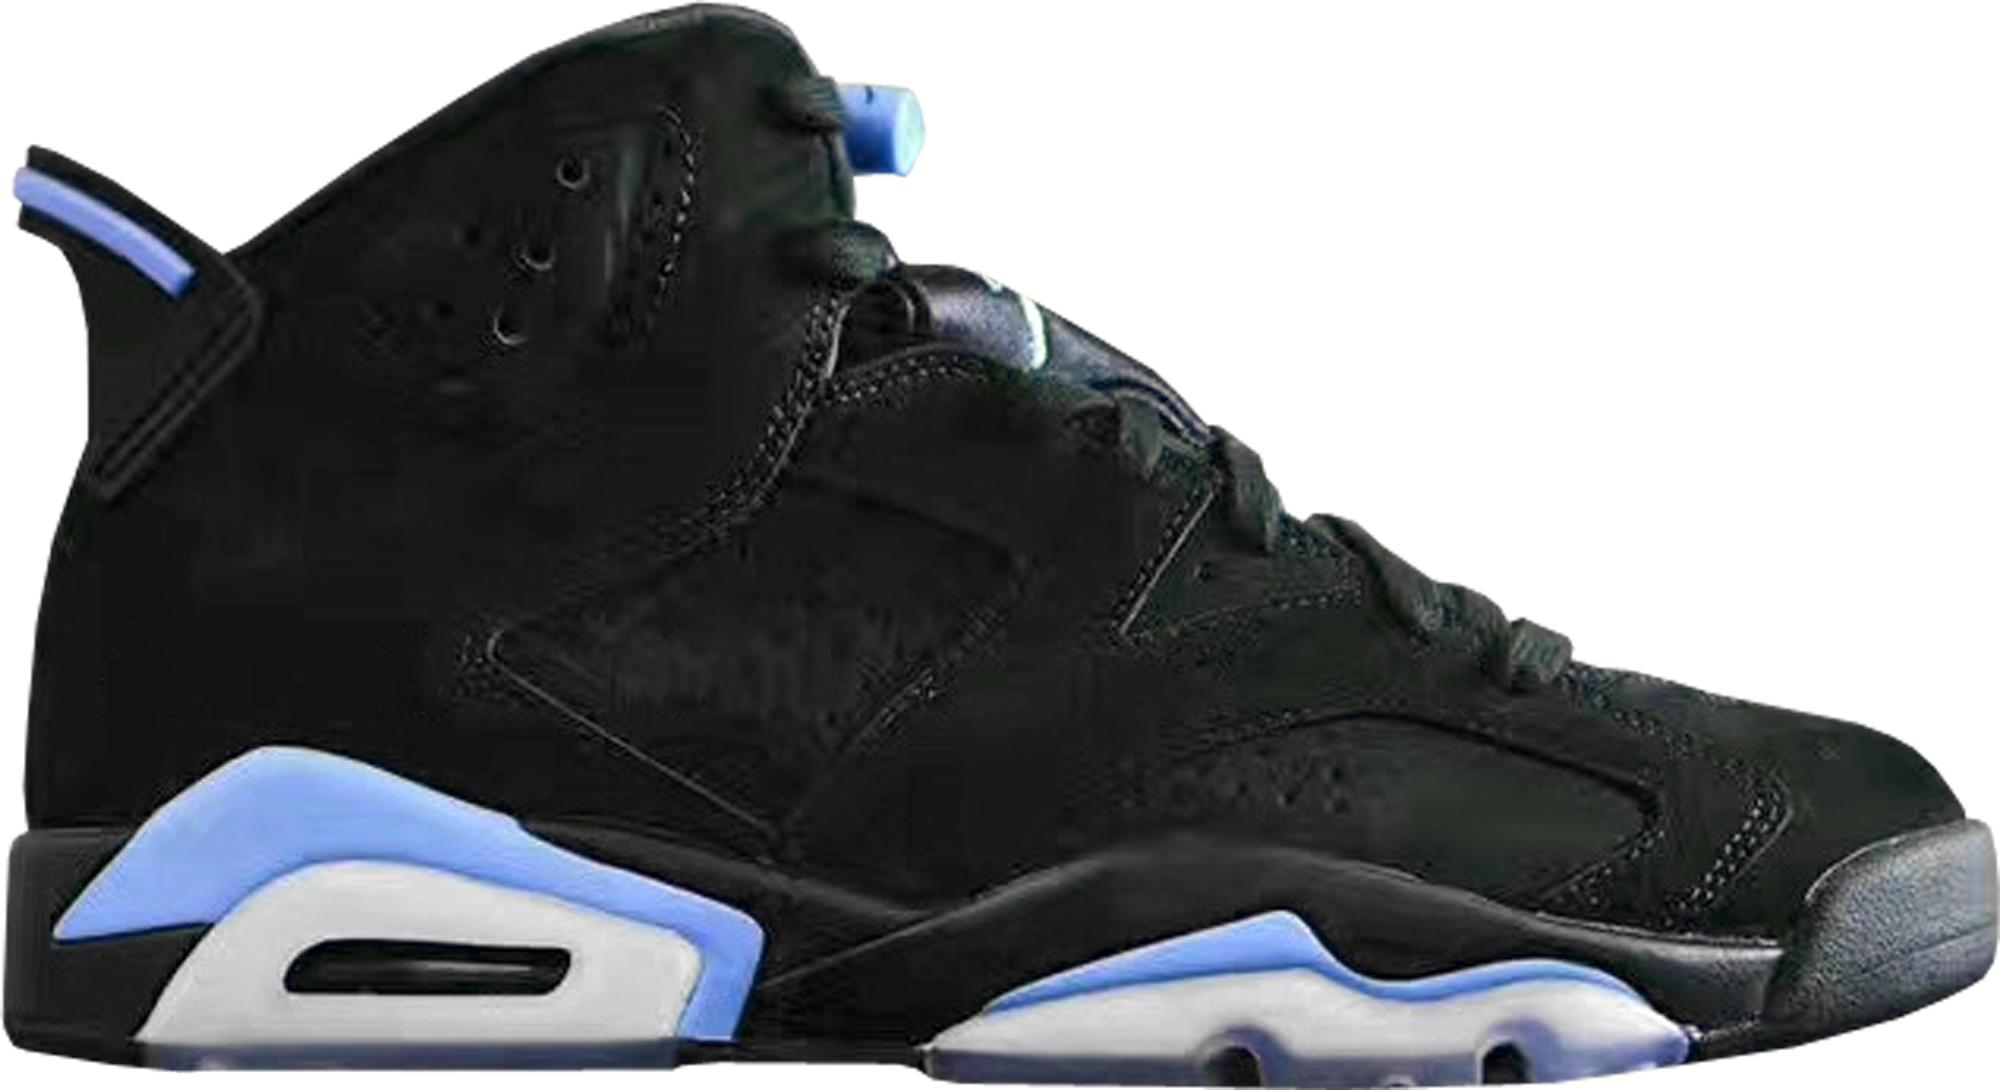 best sneakers 901b7 566ca italy air jordan 6 retro c703b f98ab  discount jordan 6 retro unc 051a1  22eb8